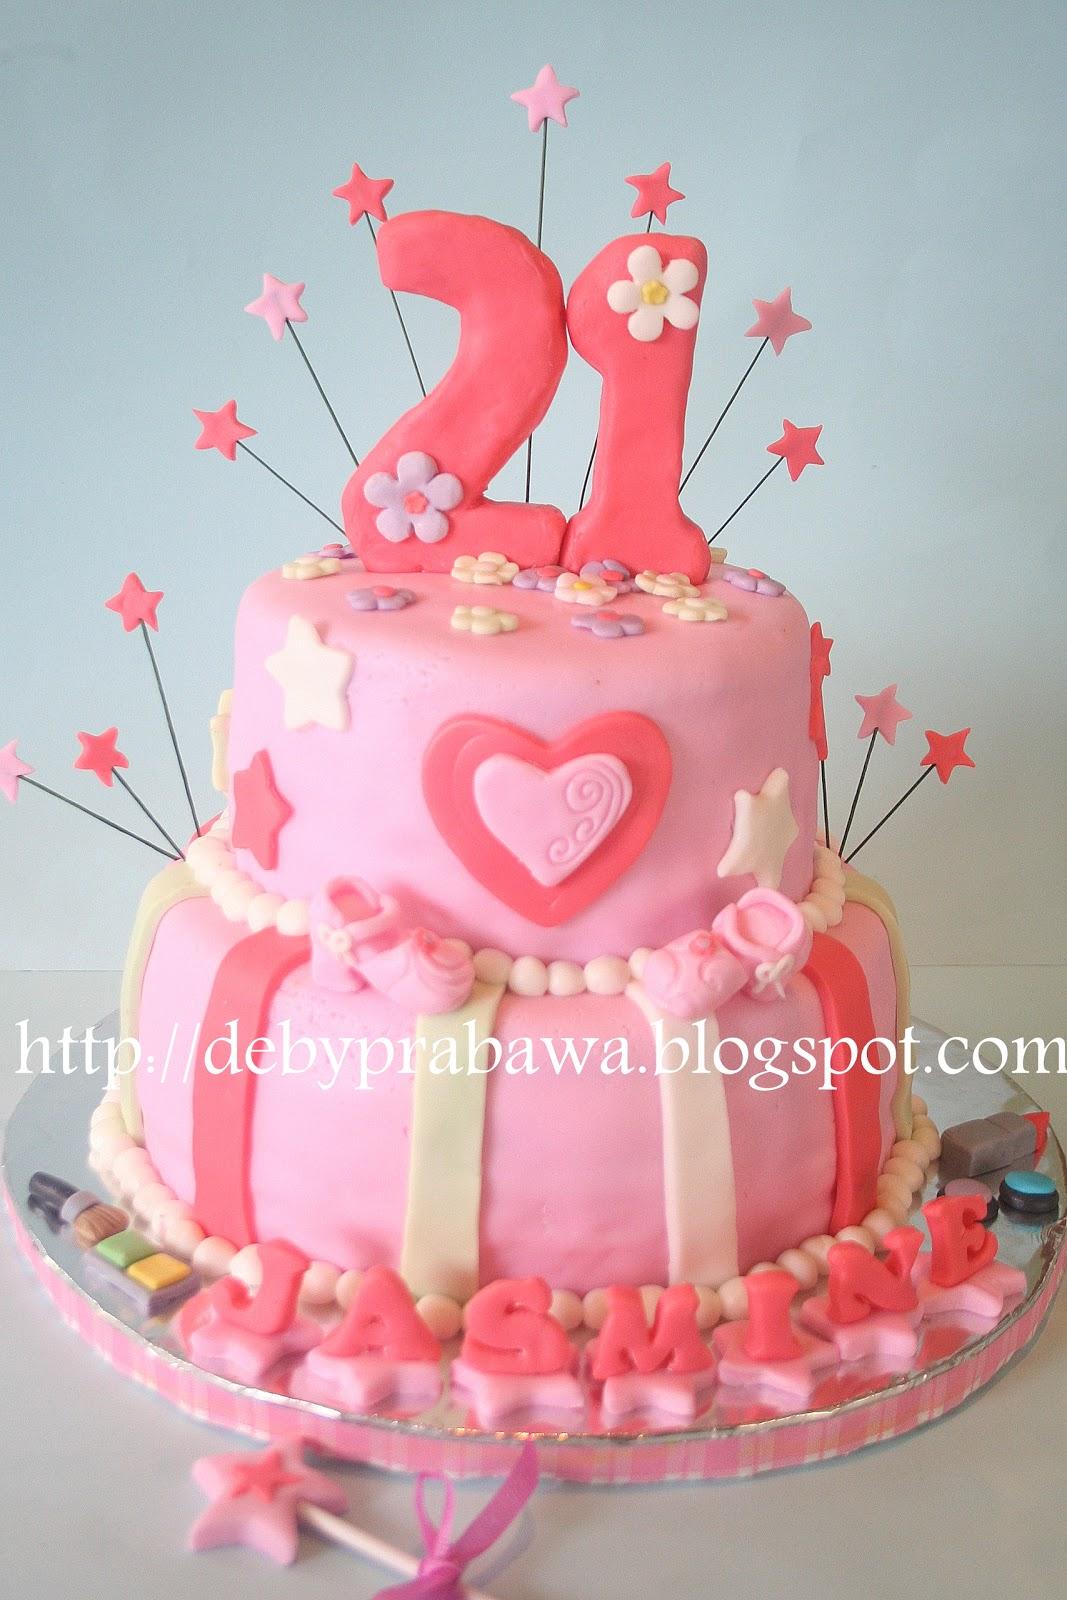 Butterfly Cake 21st Birthday Cake for Jasmine